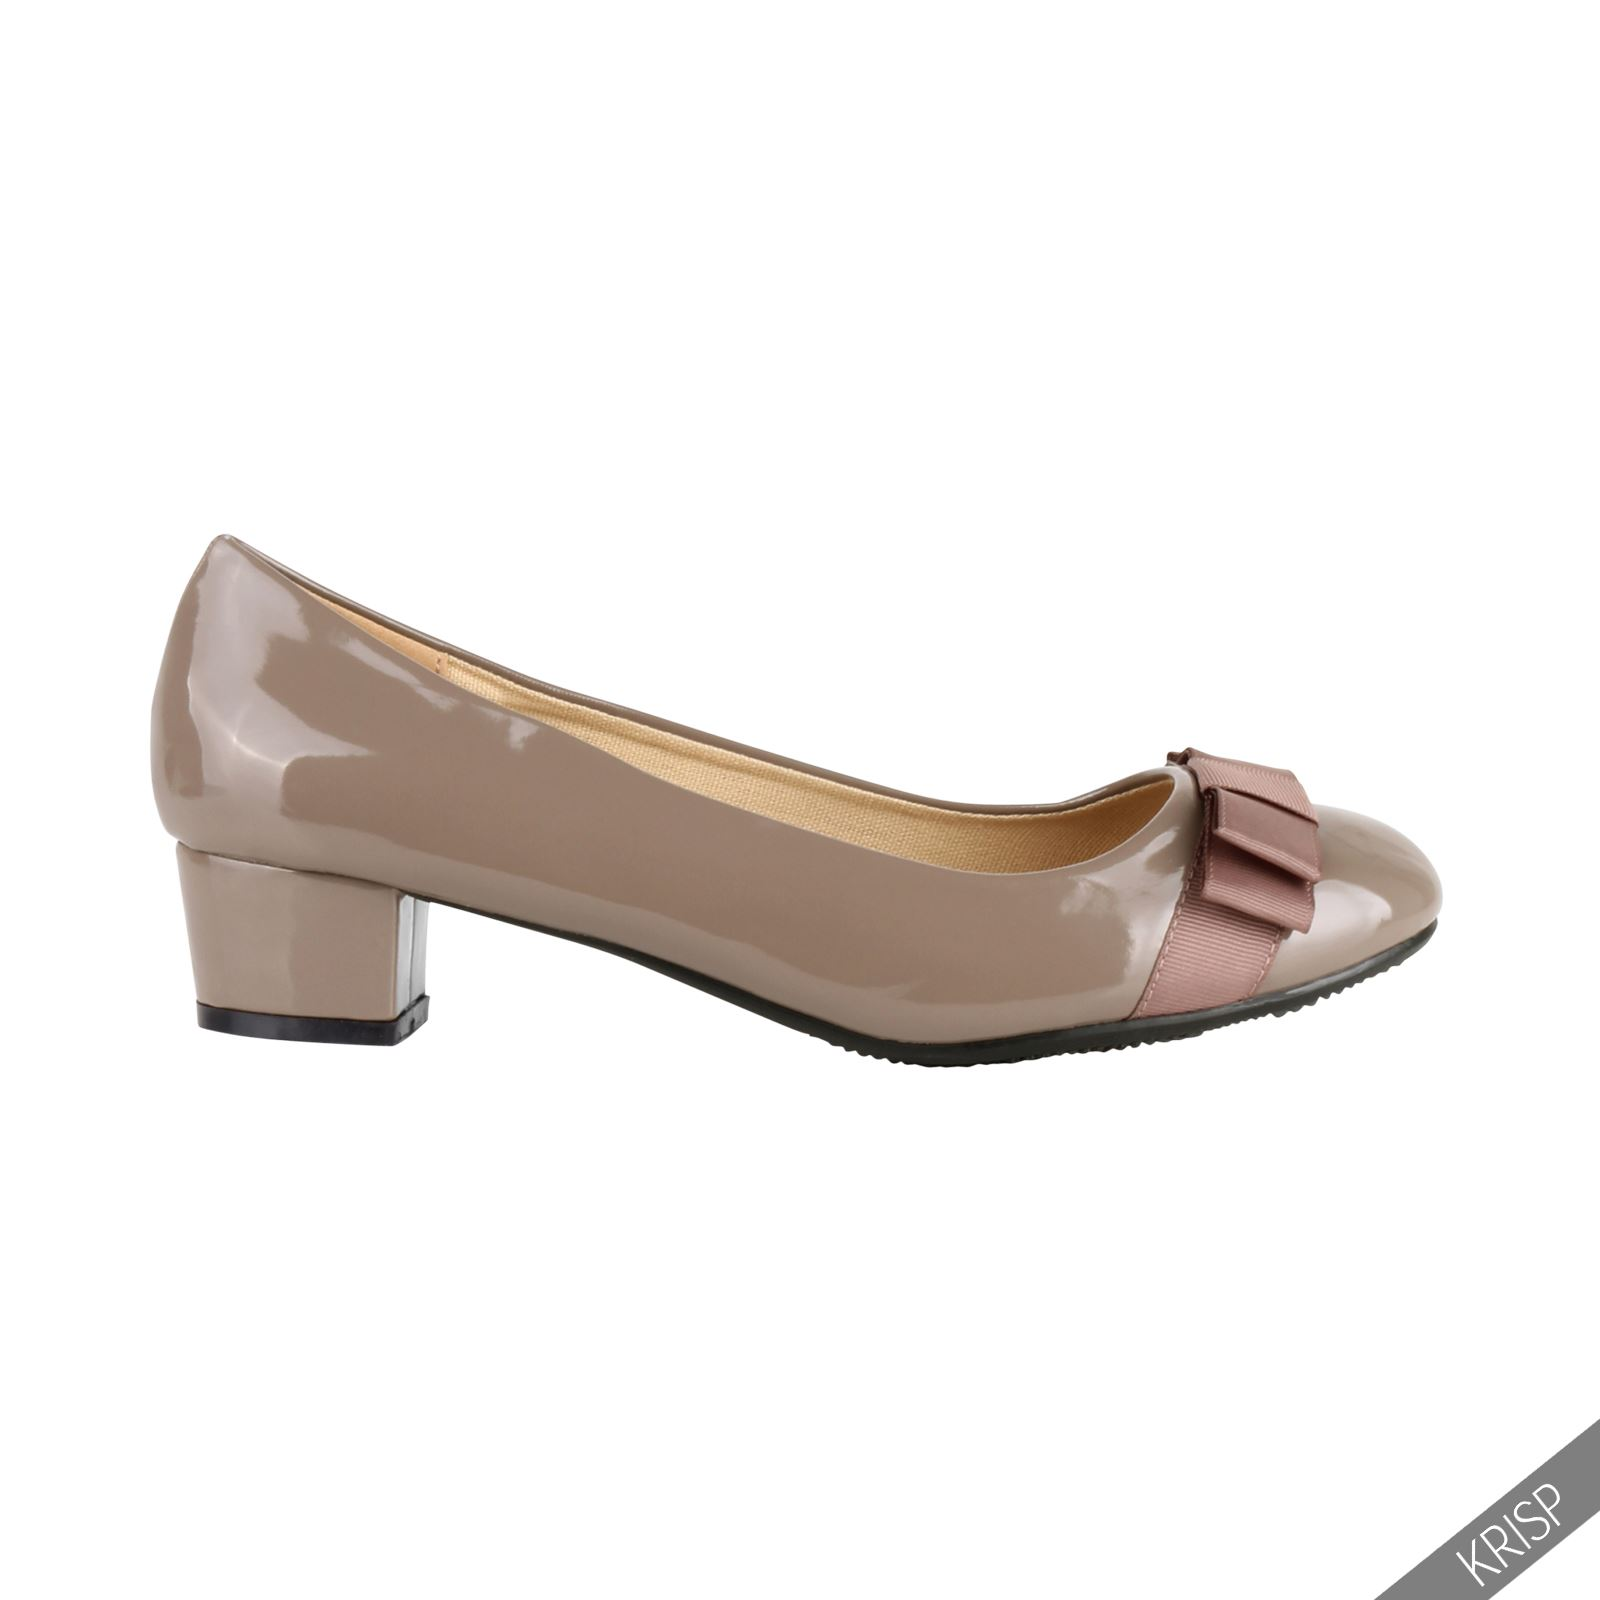 Zapatos negros Krisp para mujer oowgt